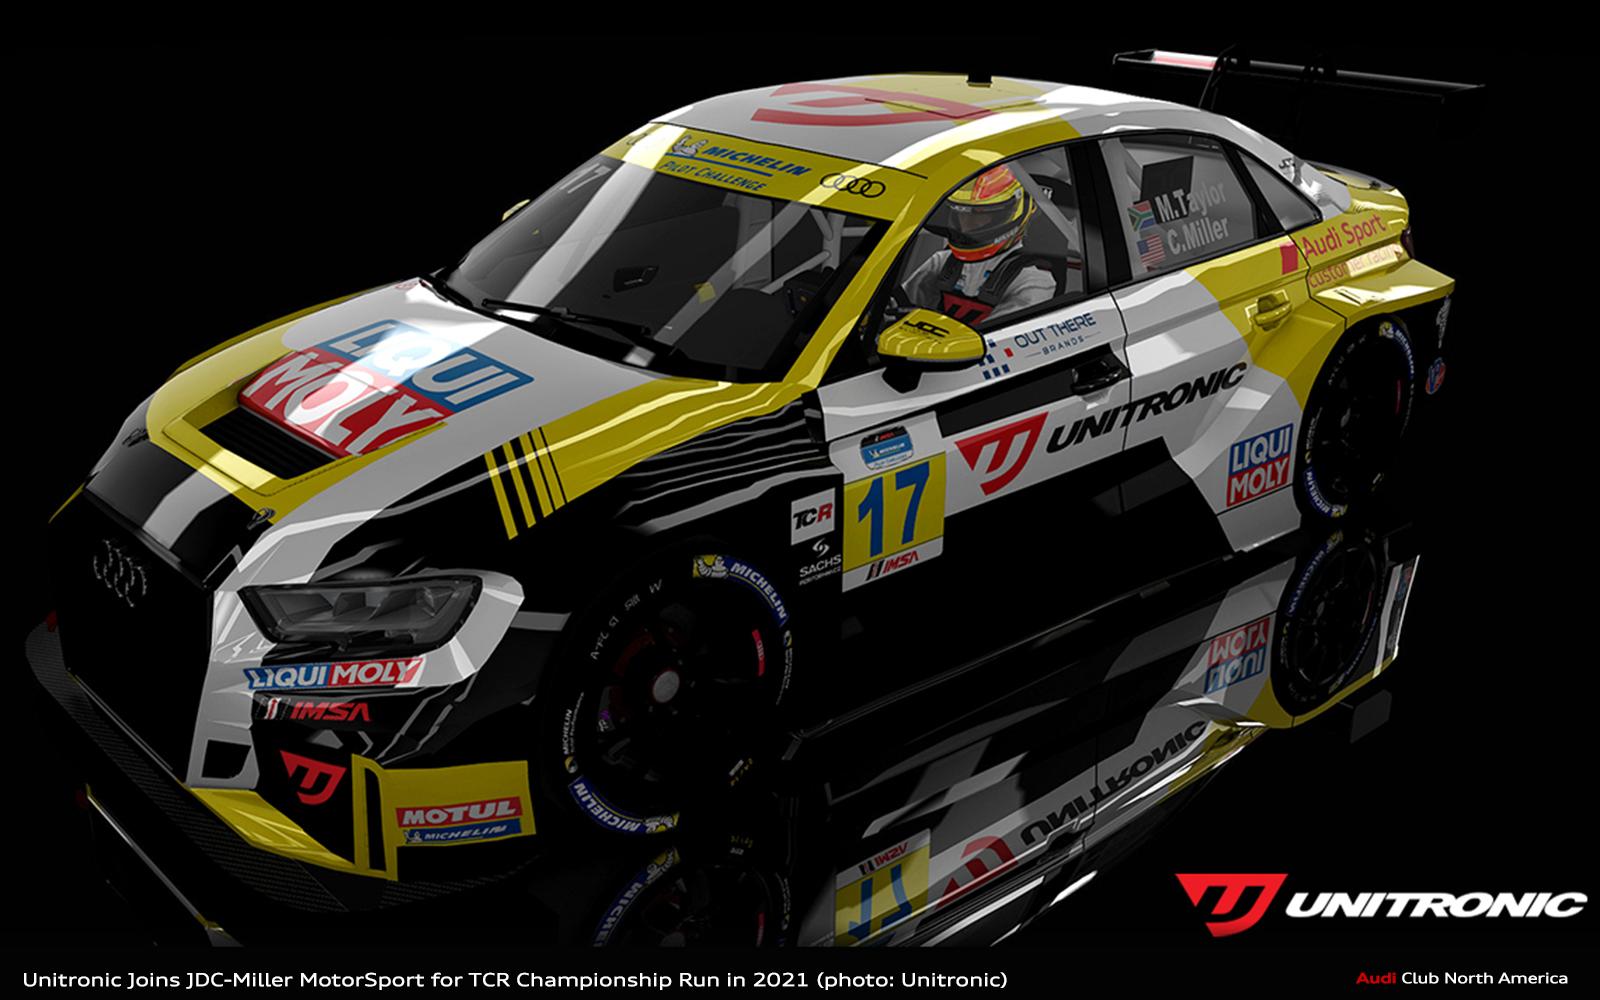 Unitronic Joins JDC-Miller MotorSport for TCR Championship Run in 2021